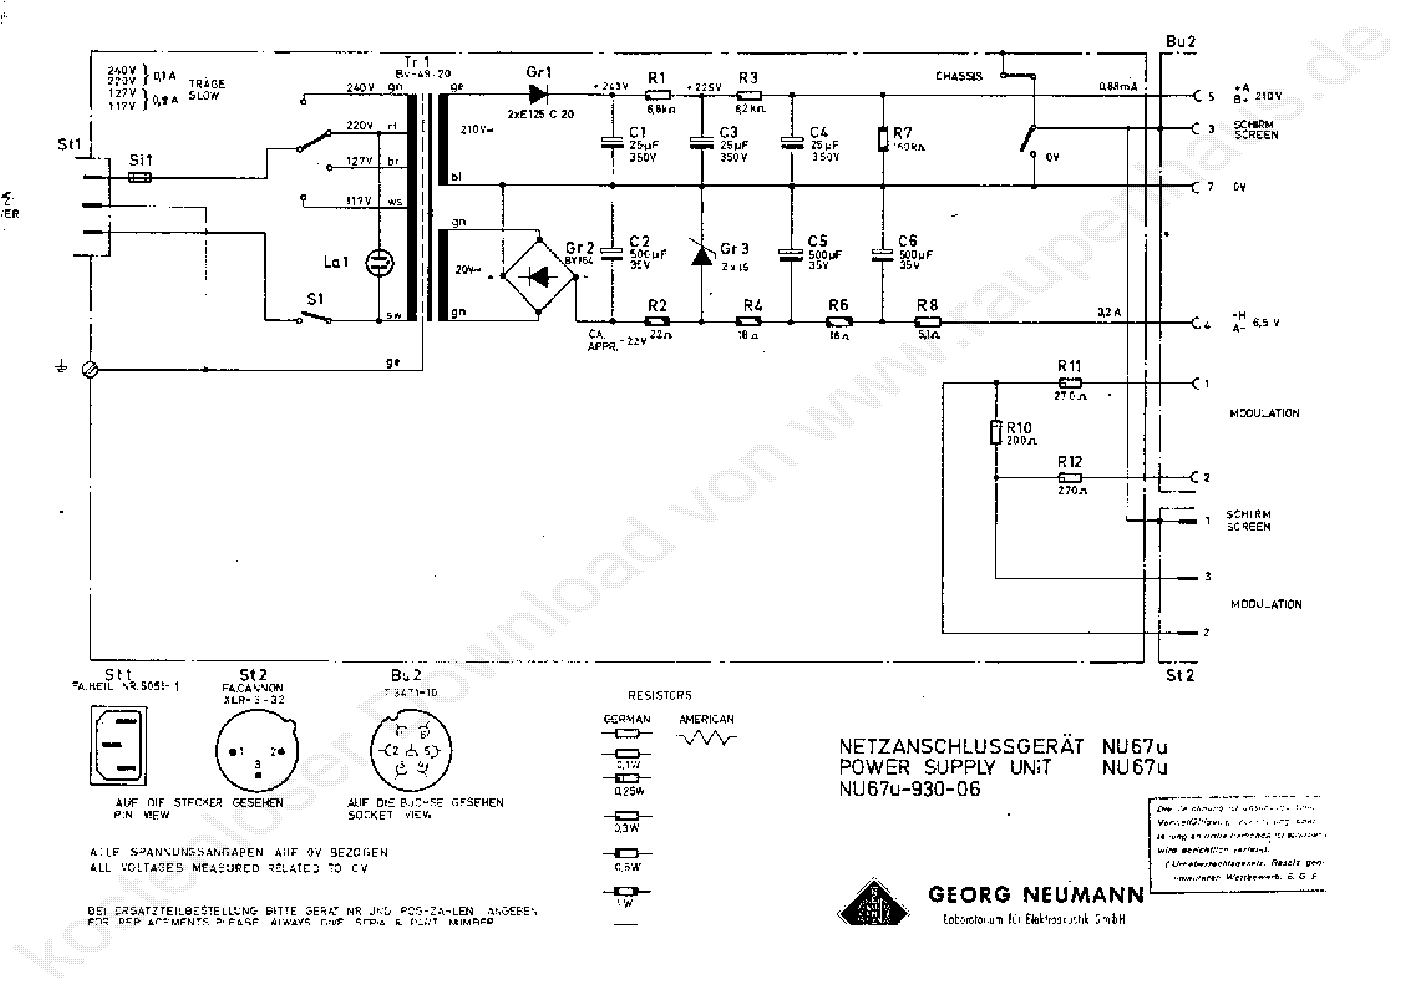 NEUMANN KONDENSATOR MIKROFON NETZGERA T NU 67 Service Manual ...